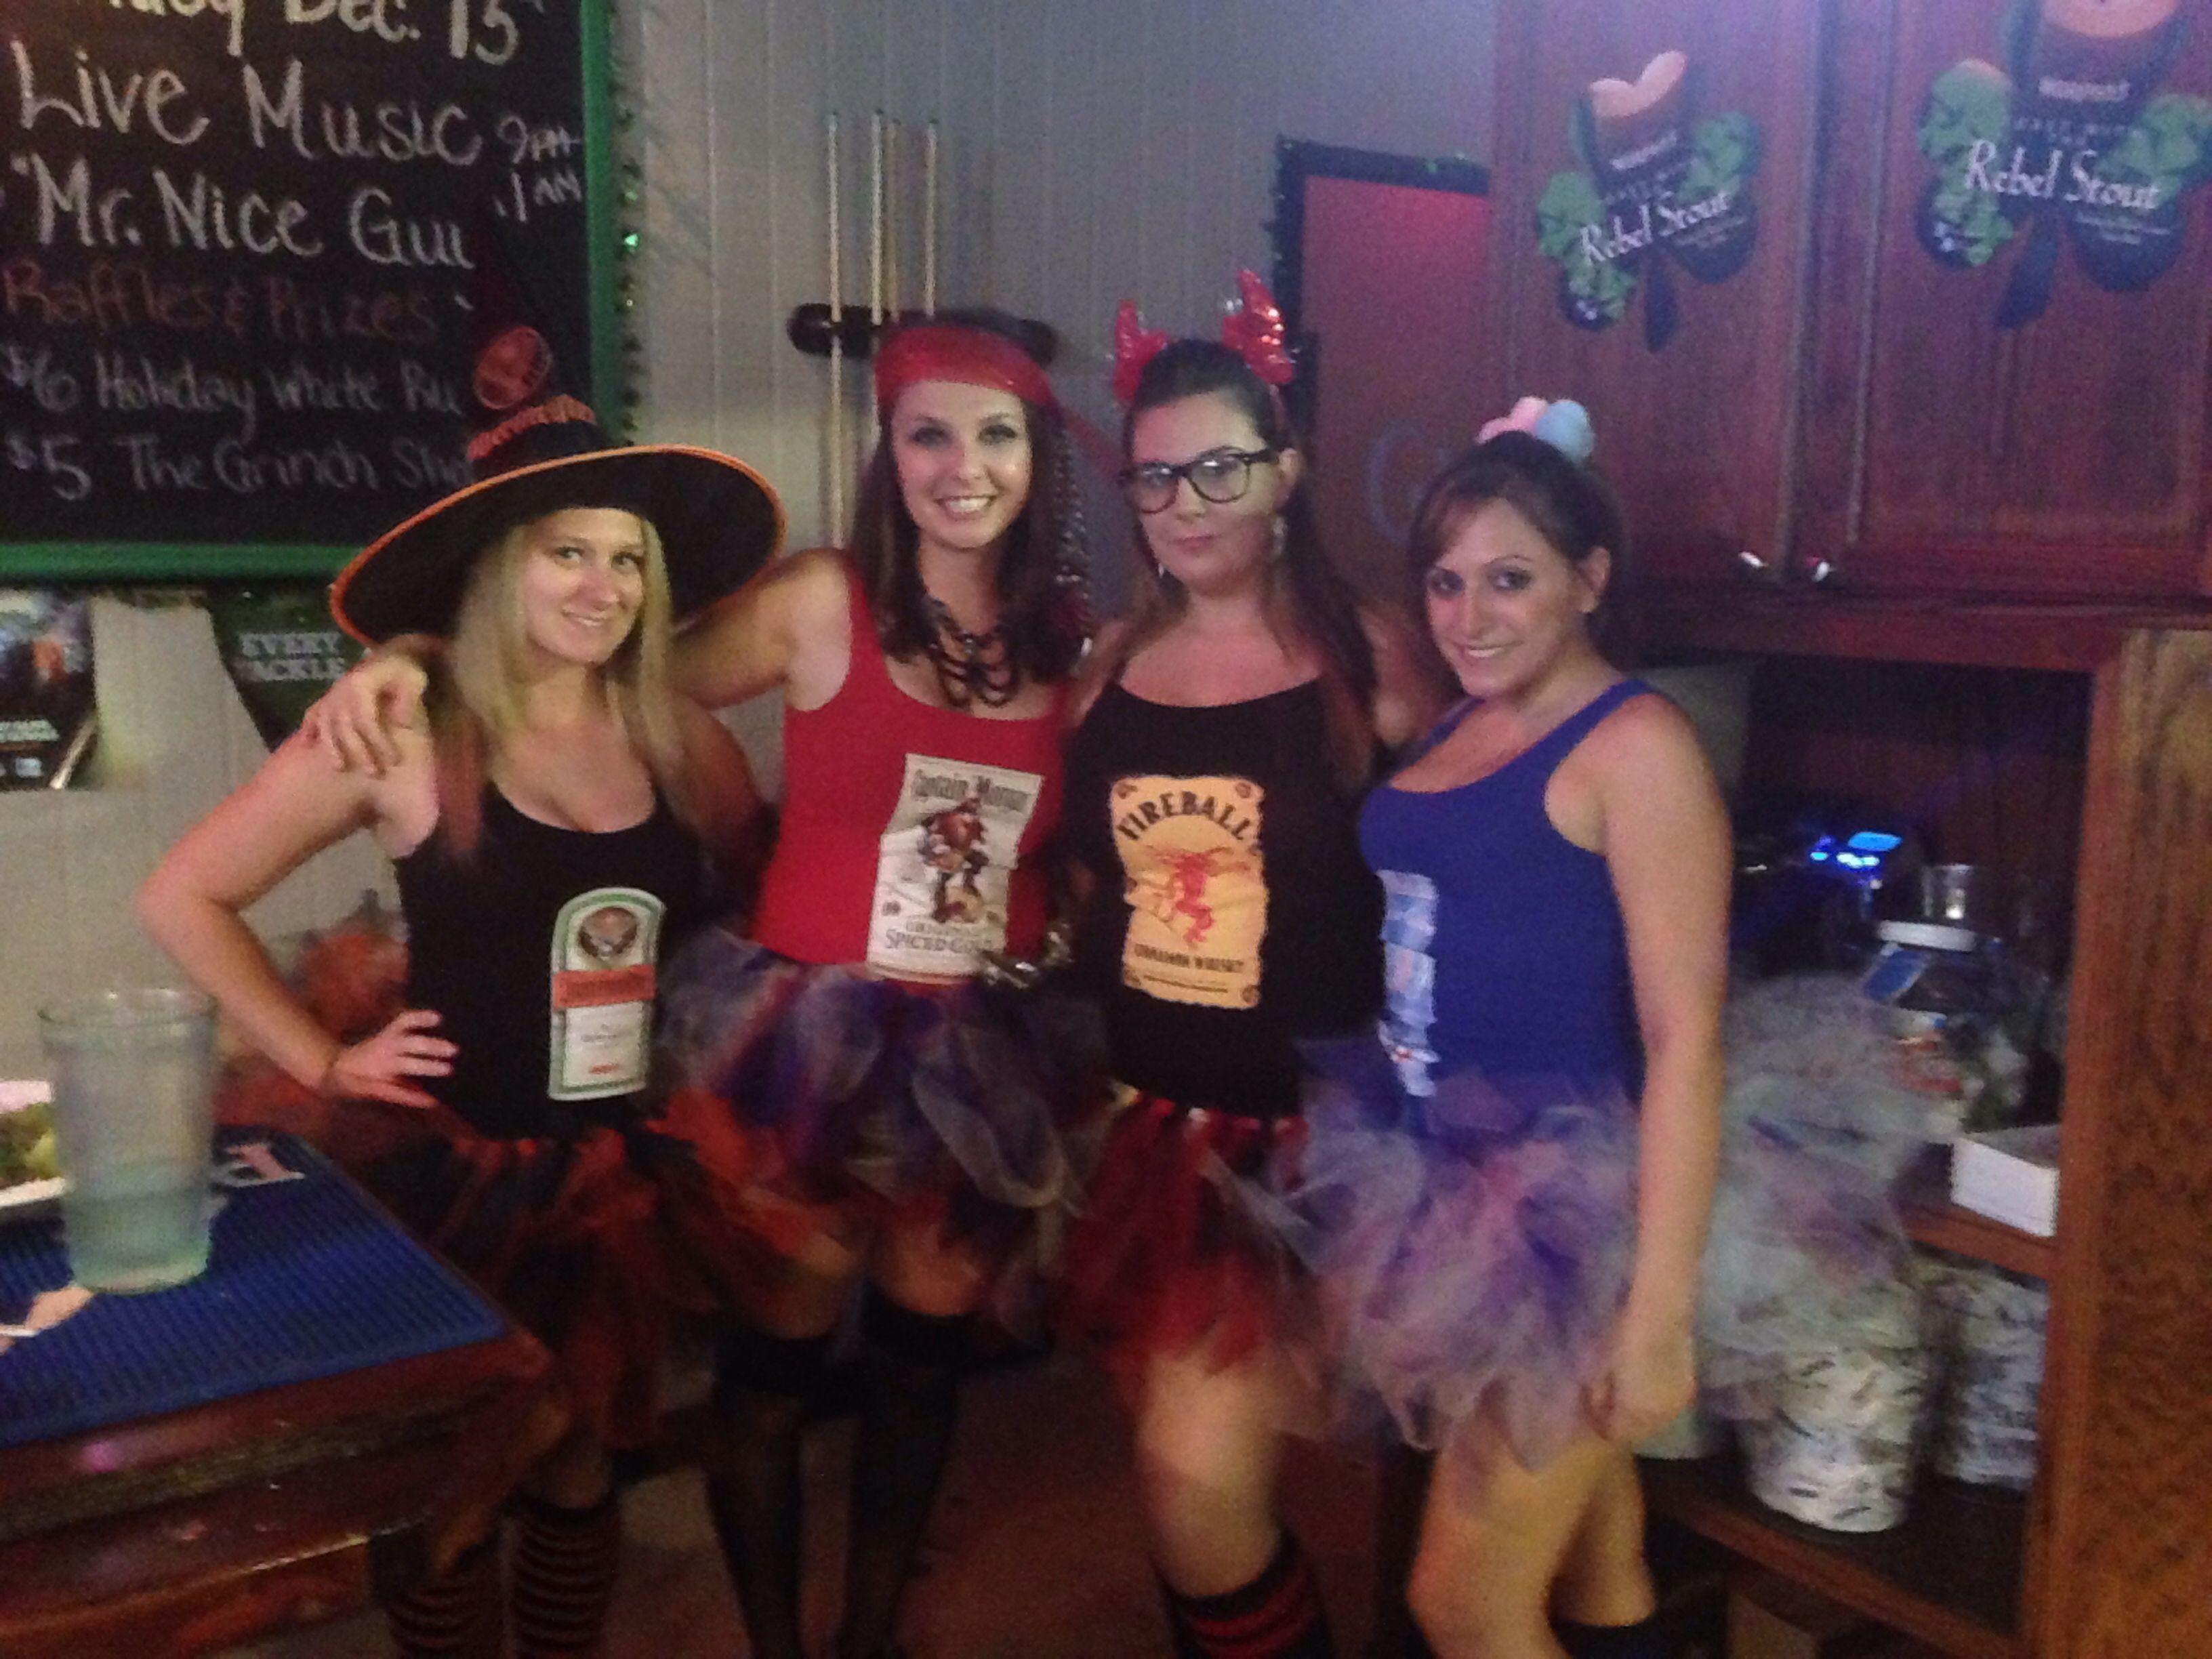 Jagermeister, Captain Morgan, Fireball, Pinnacle Cotton Candy ...